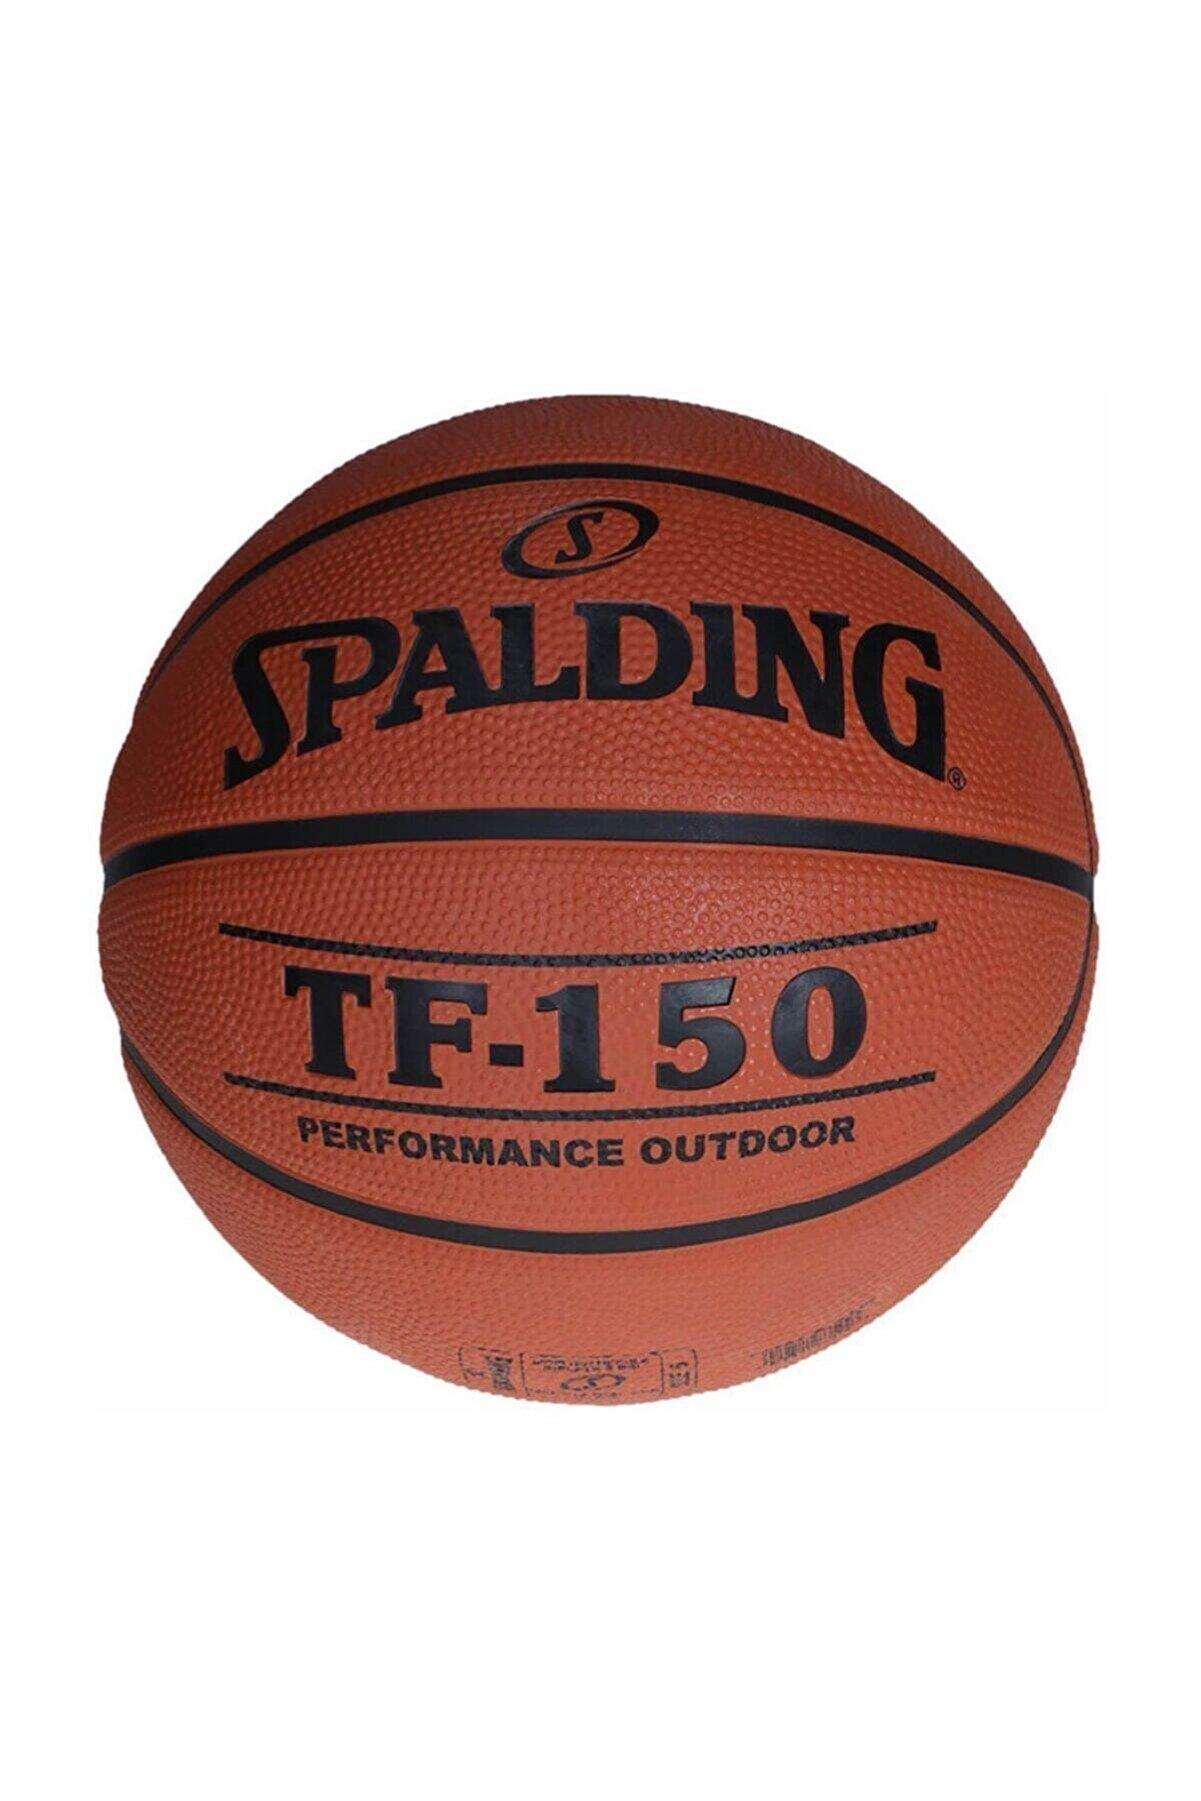 Spalding Tf-150 Performance Fiba Basketbol Topu No:5